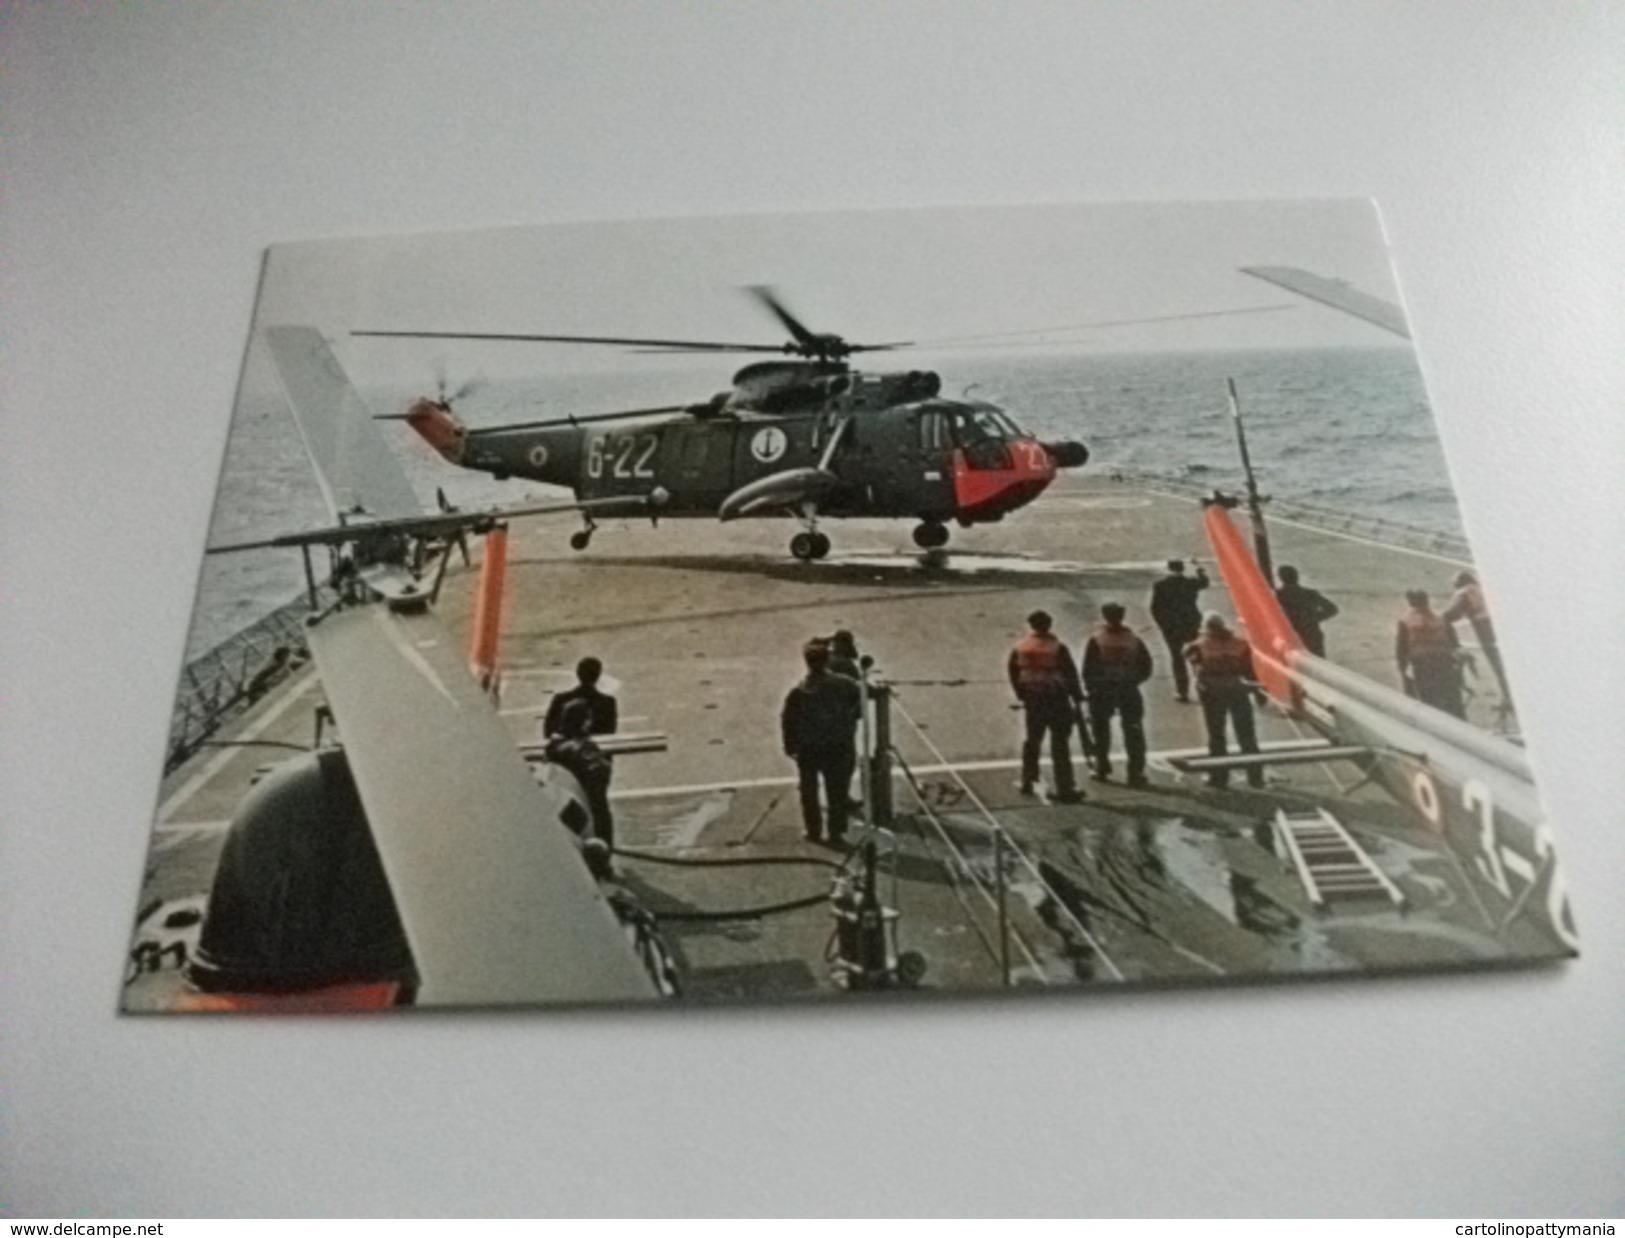 ELICOTTERO ANTISOM SIKORSKY SHSD - Elicotteri